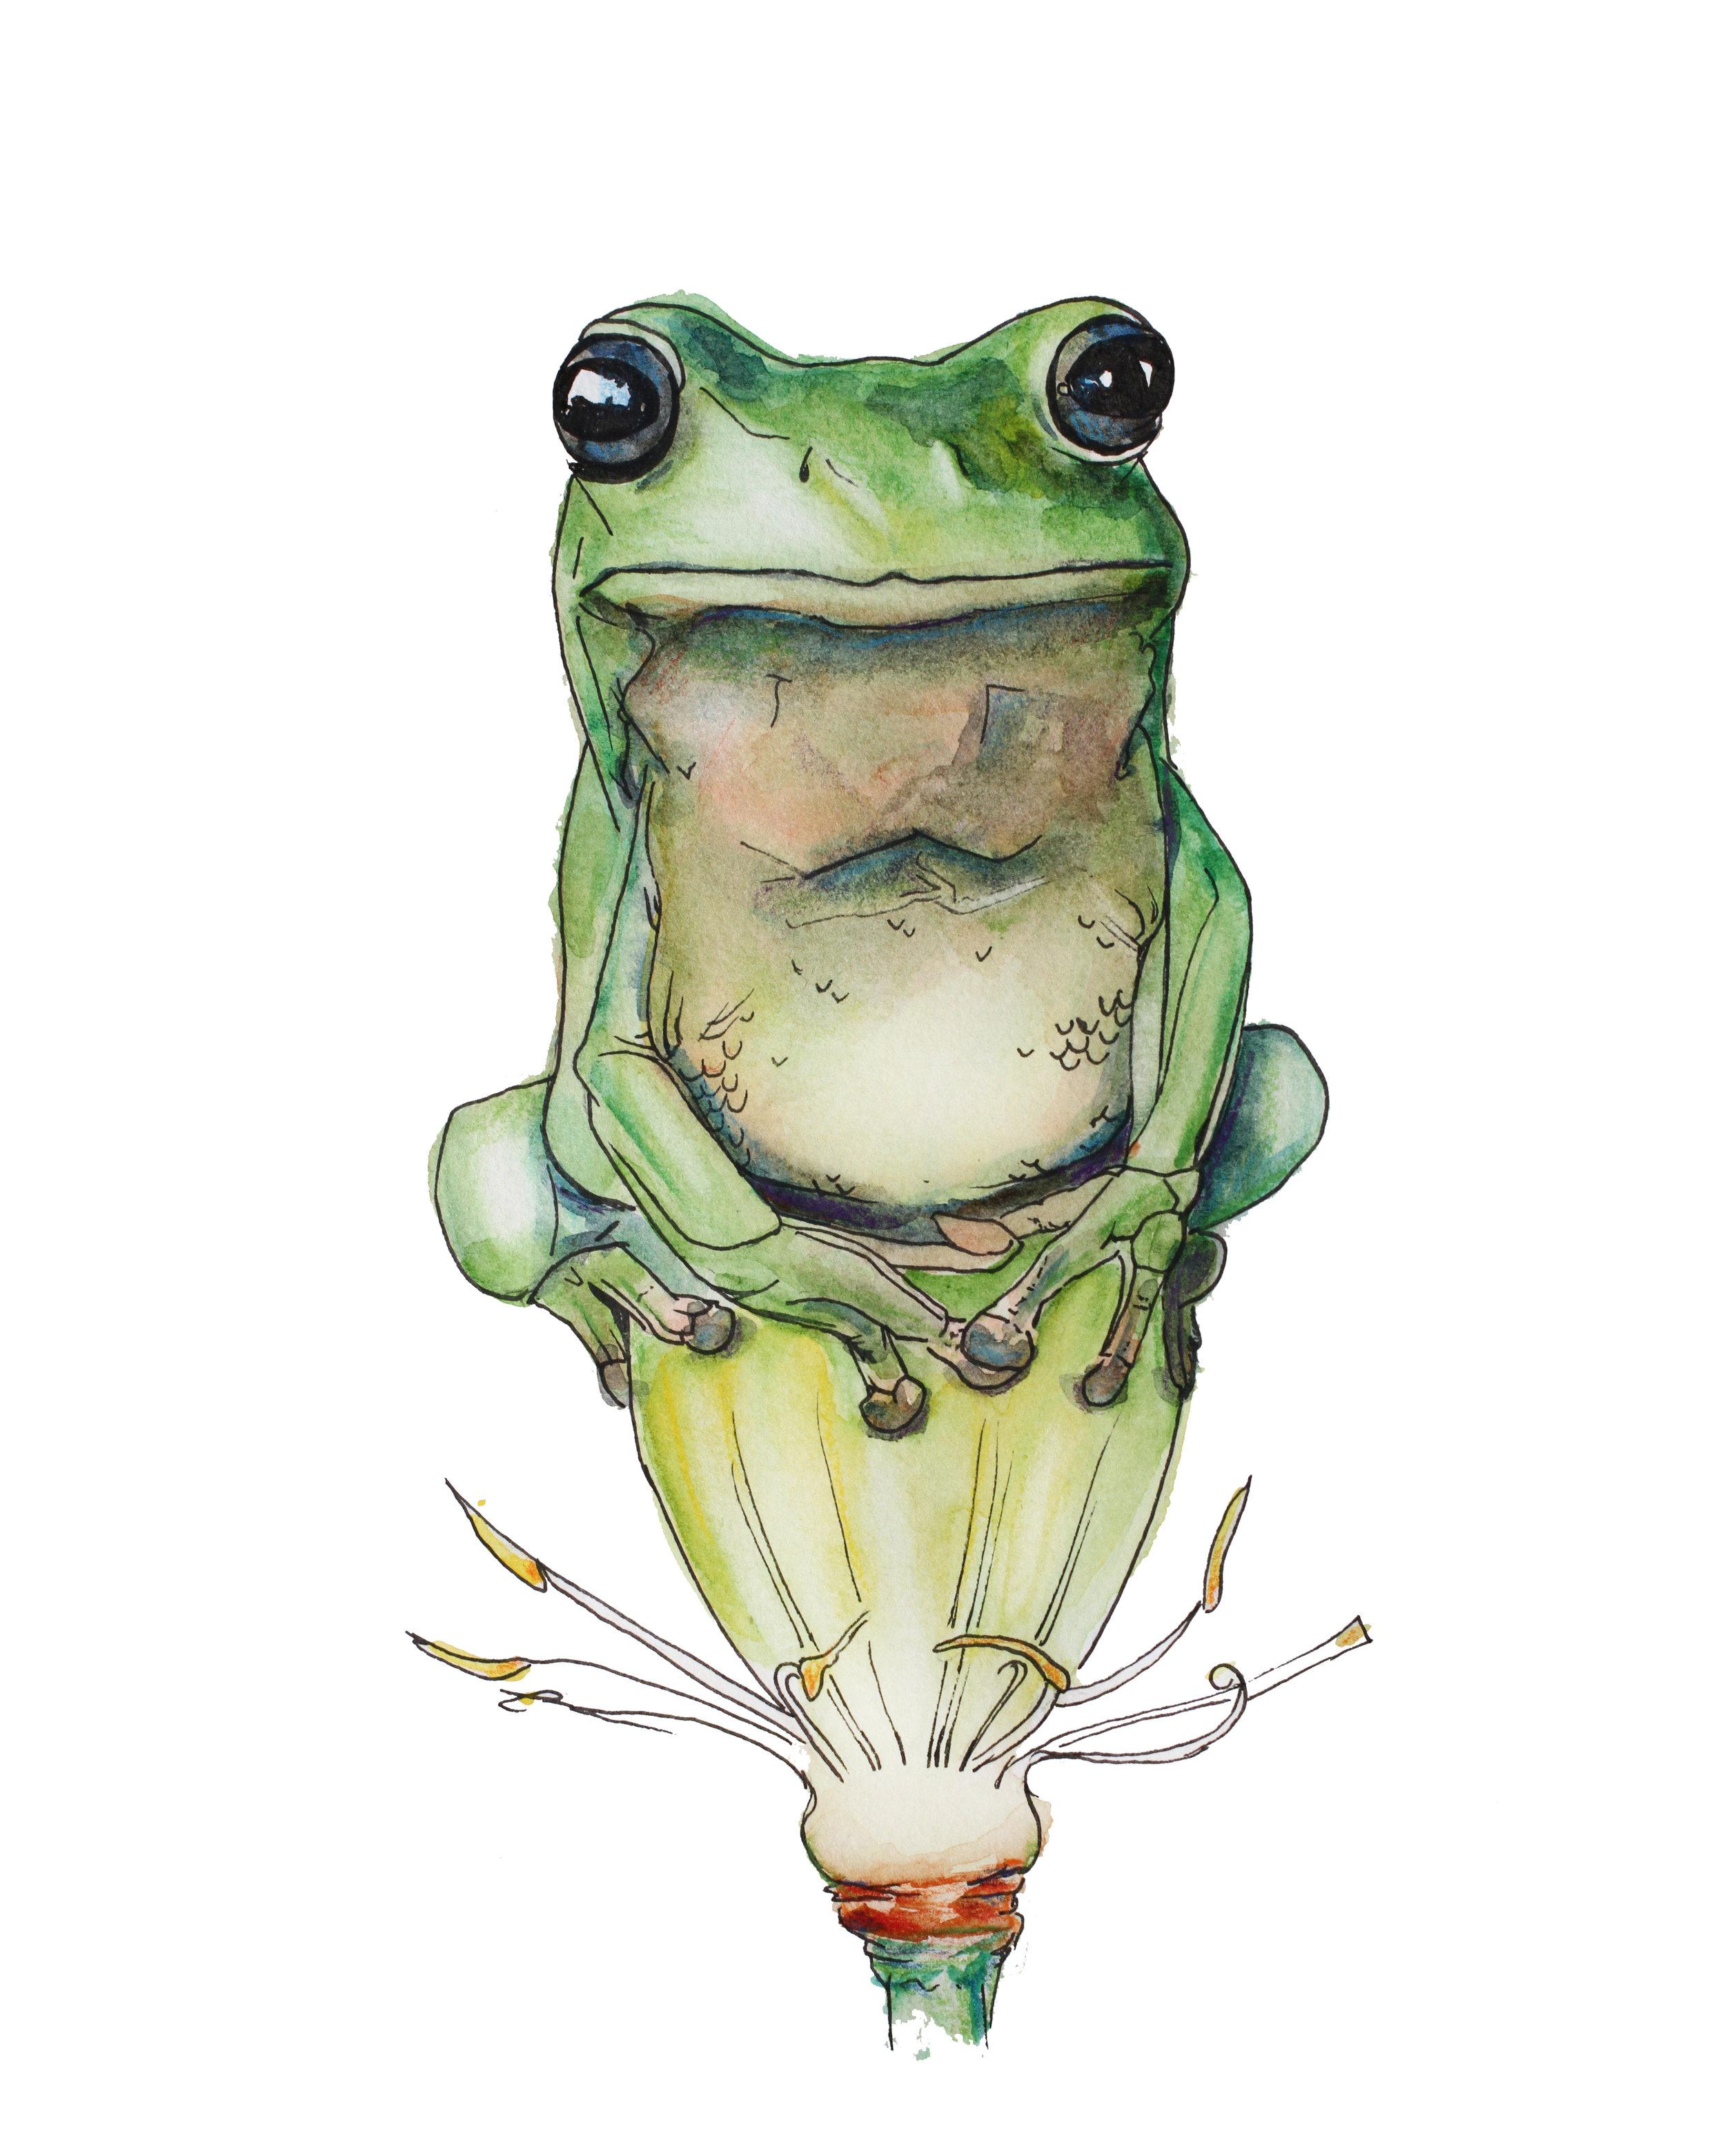 frog 8x10_1.jpg